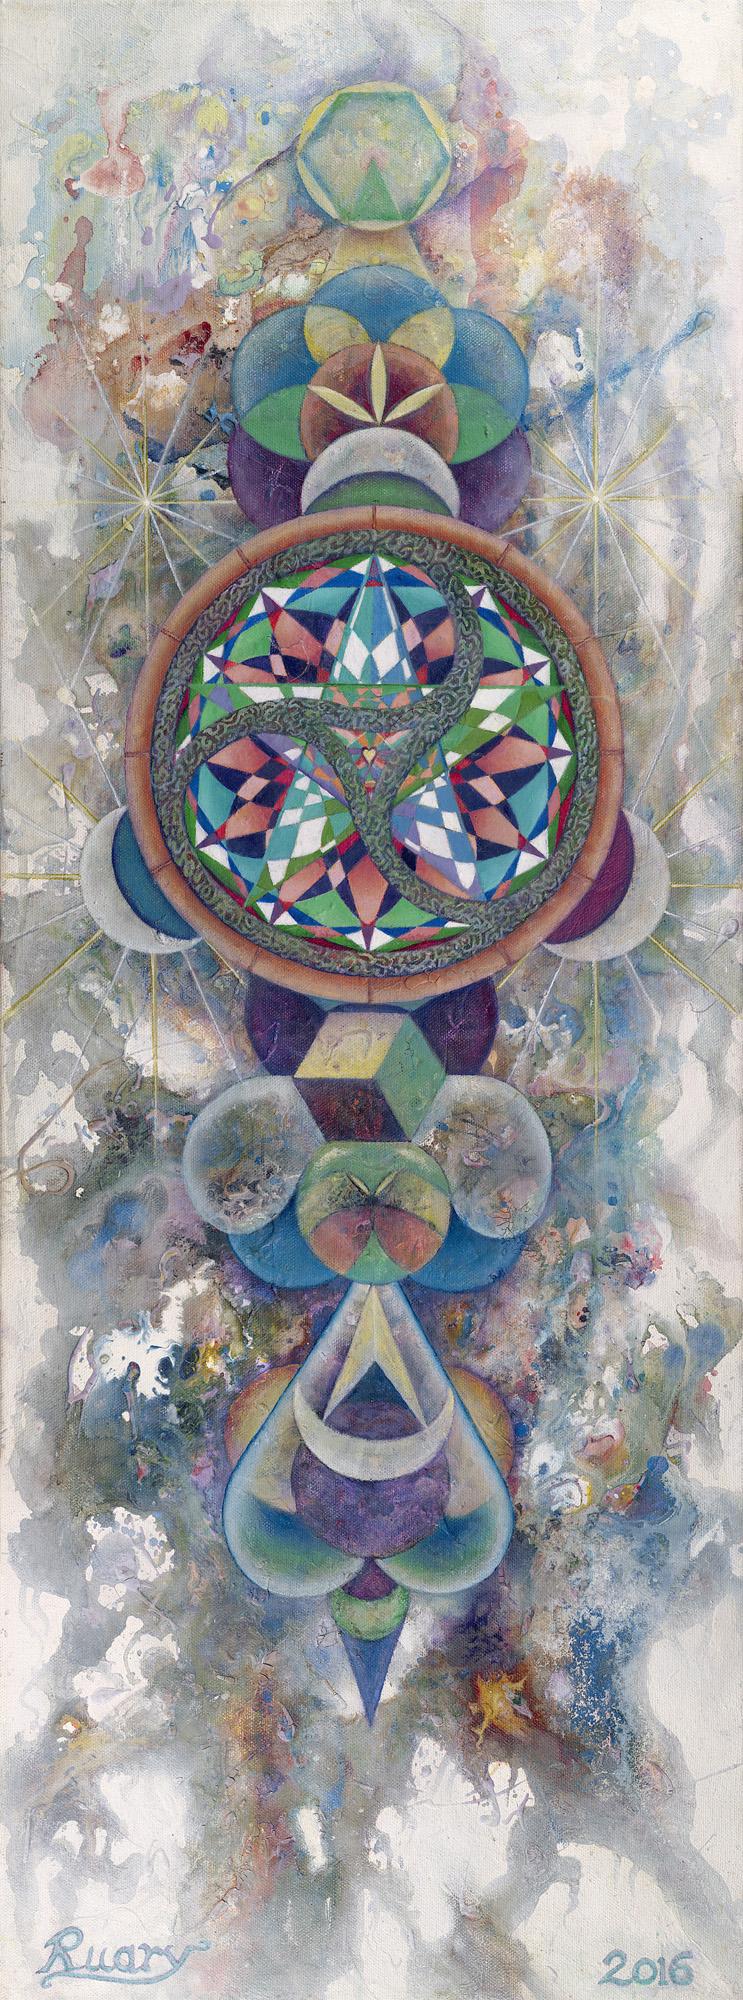 Sacred Chaos (2016), Oil on canvas, 12 x 30″, Glastonbury, England